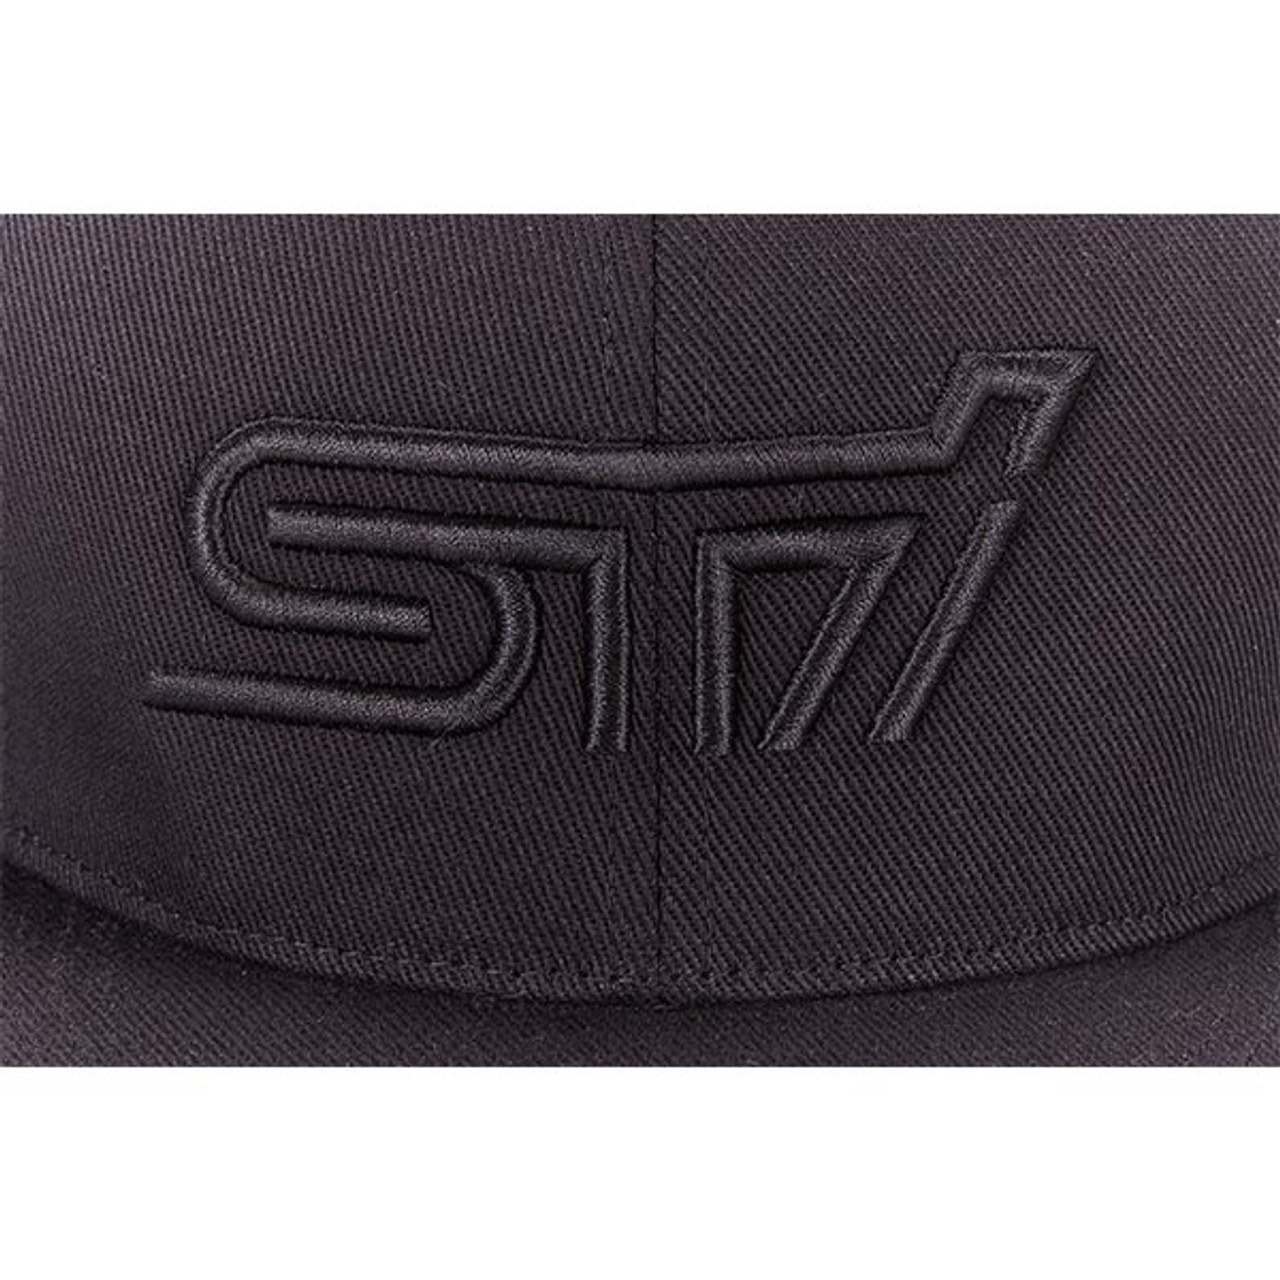 STI Flat Cap STSG18100420 logo front at AVOJDM.com